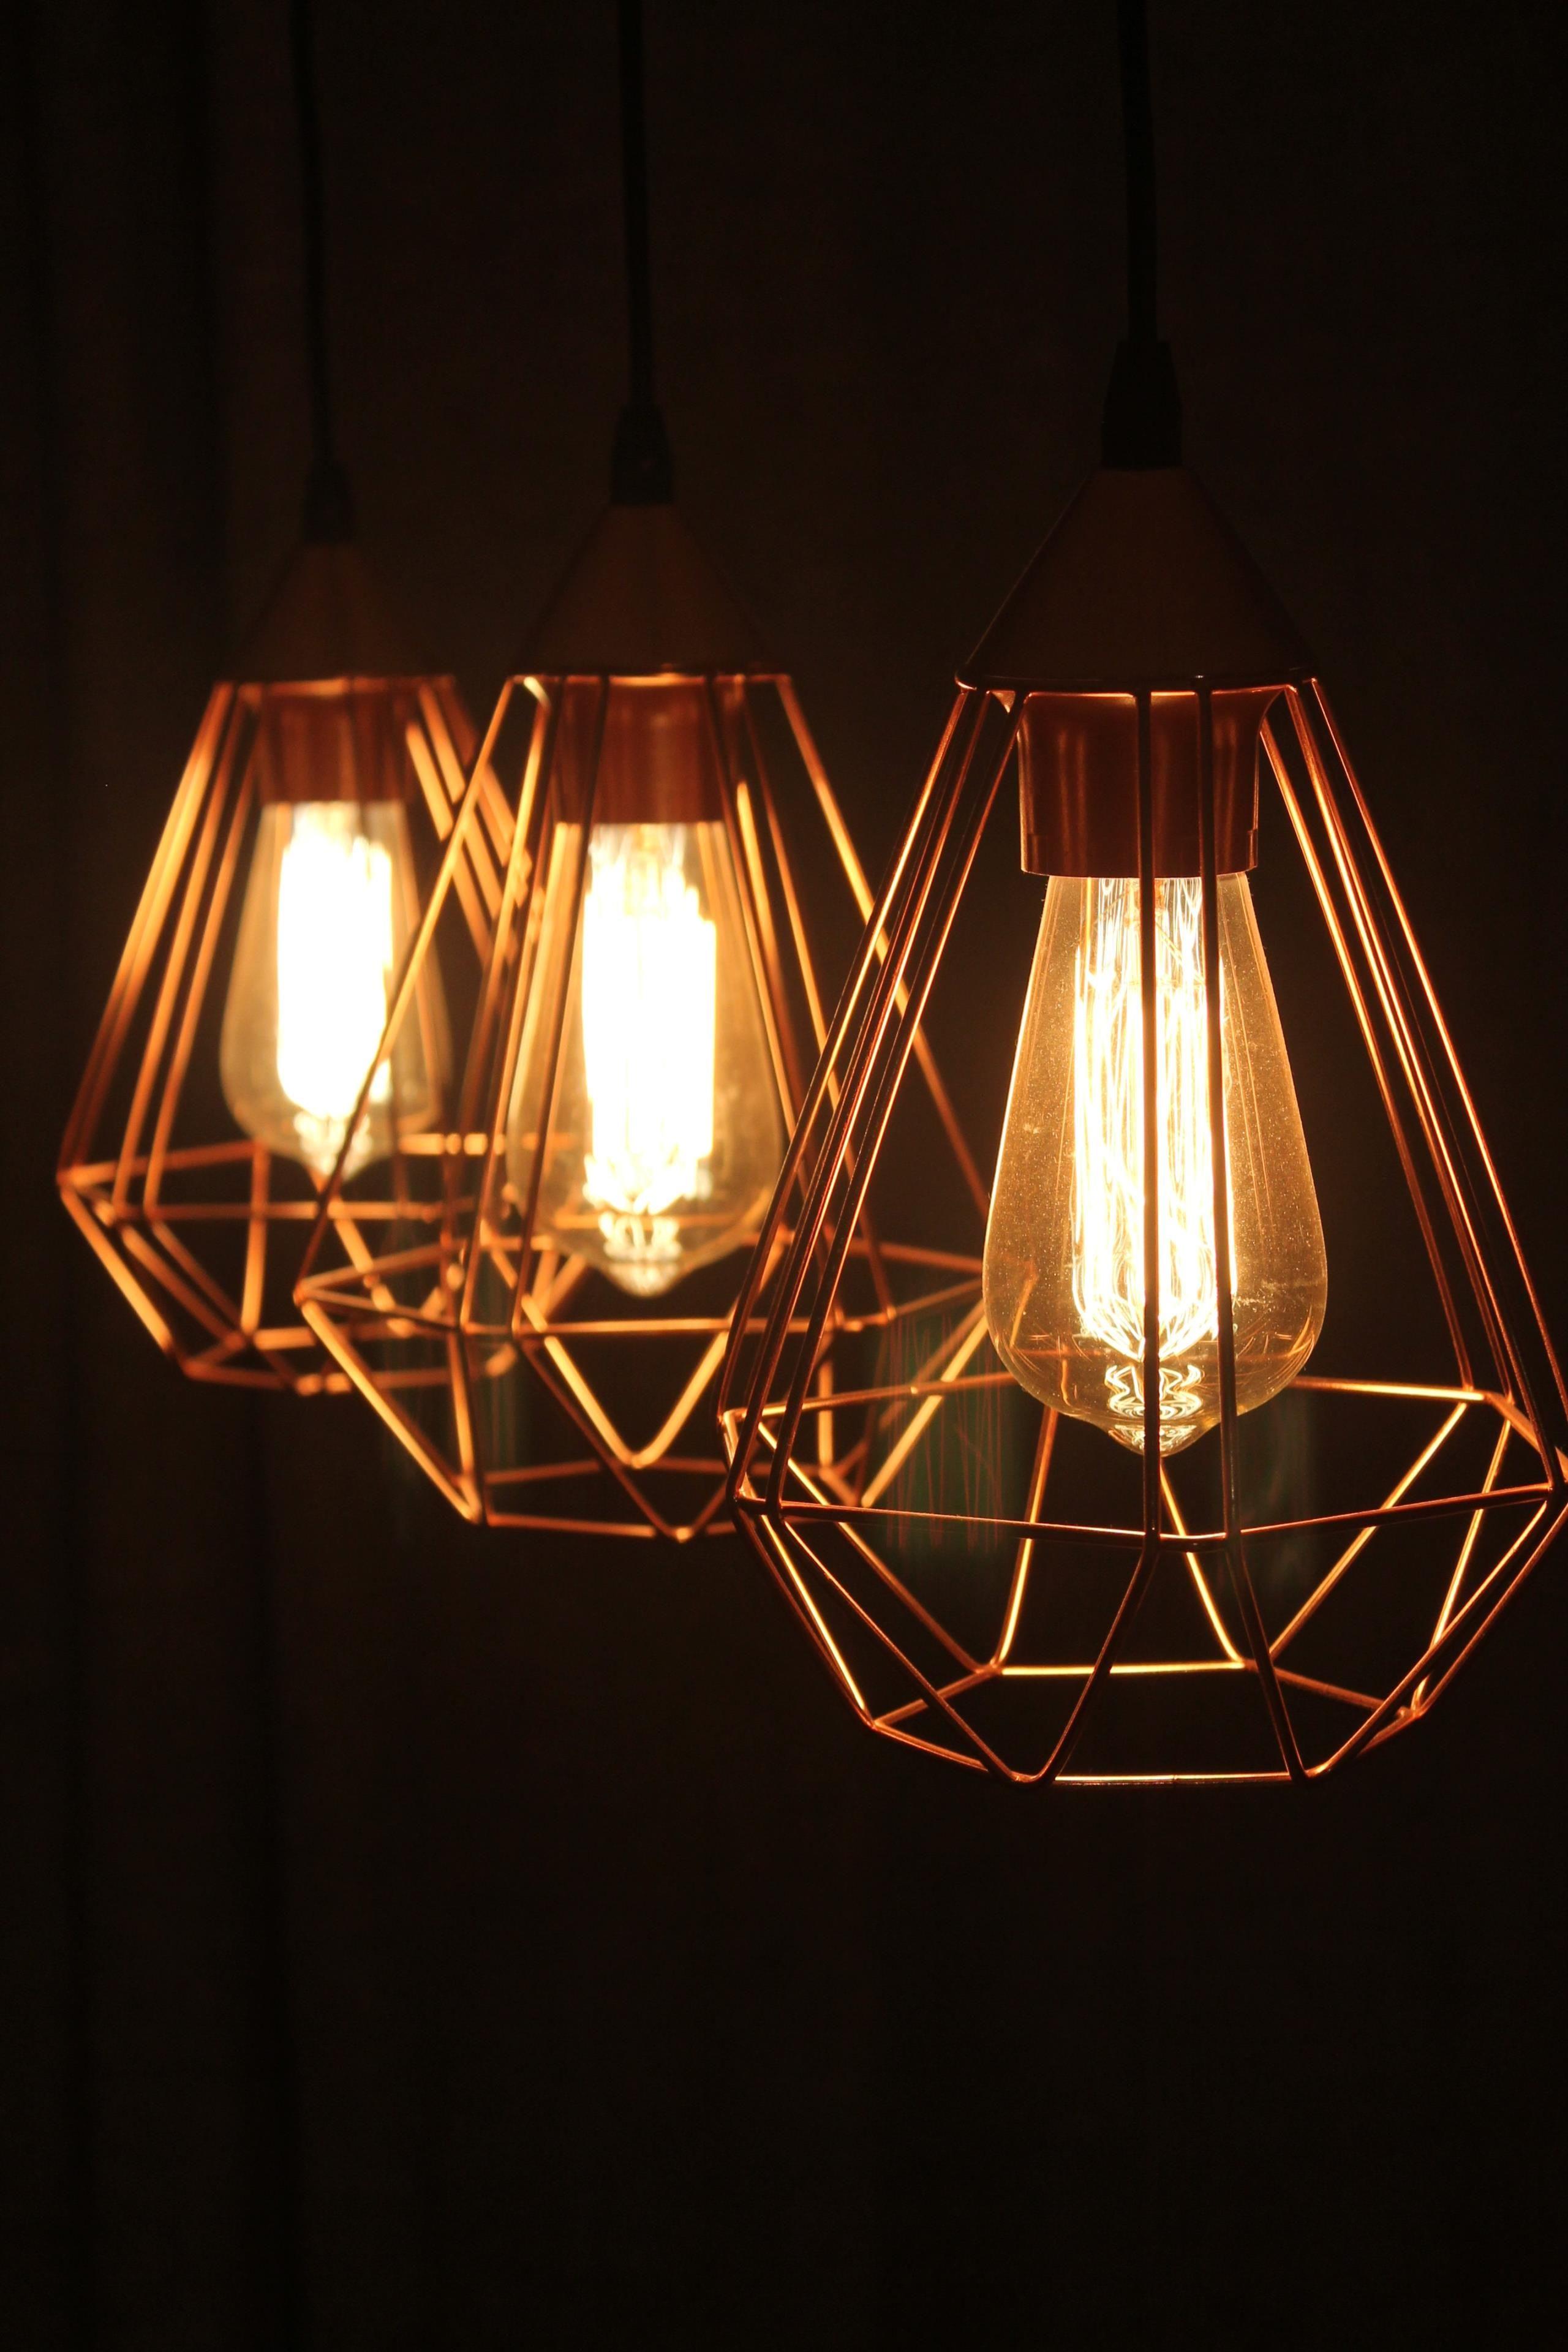 Amoled Lights Wallpaper Rustic Pendant Lighting Kitchen Cage Pendant Light Black Cage Pendant Lighting